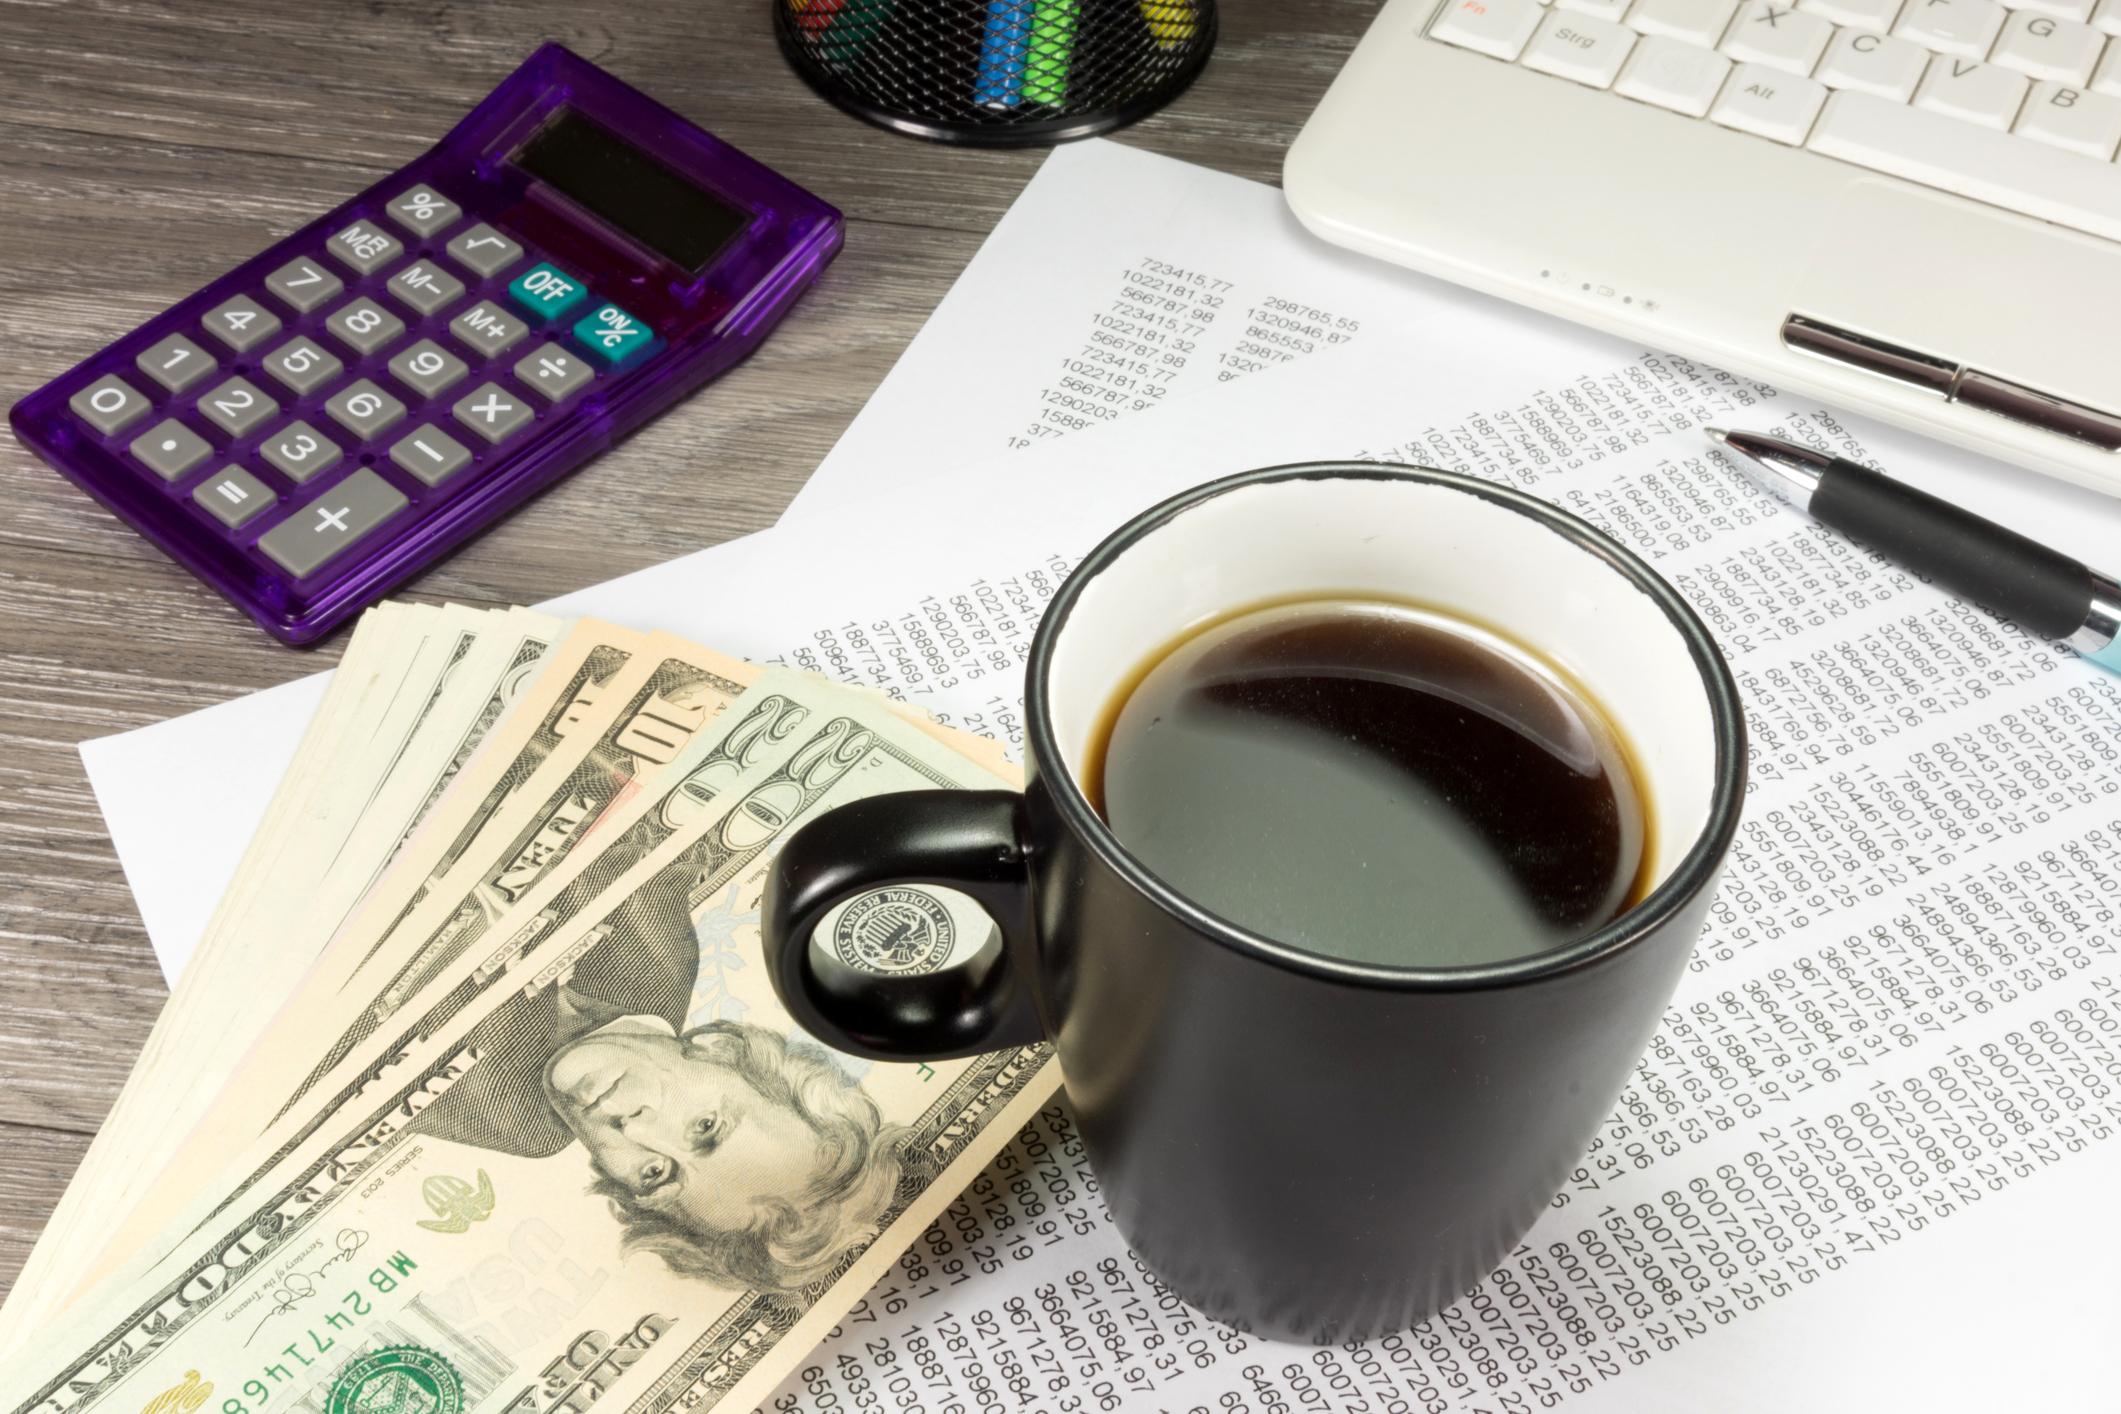 Calculator, cash, paperwork, and coffee